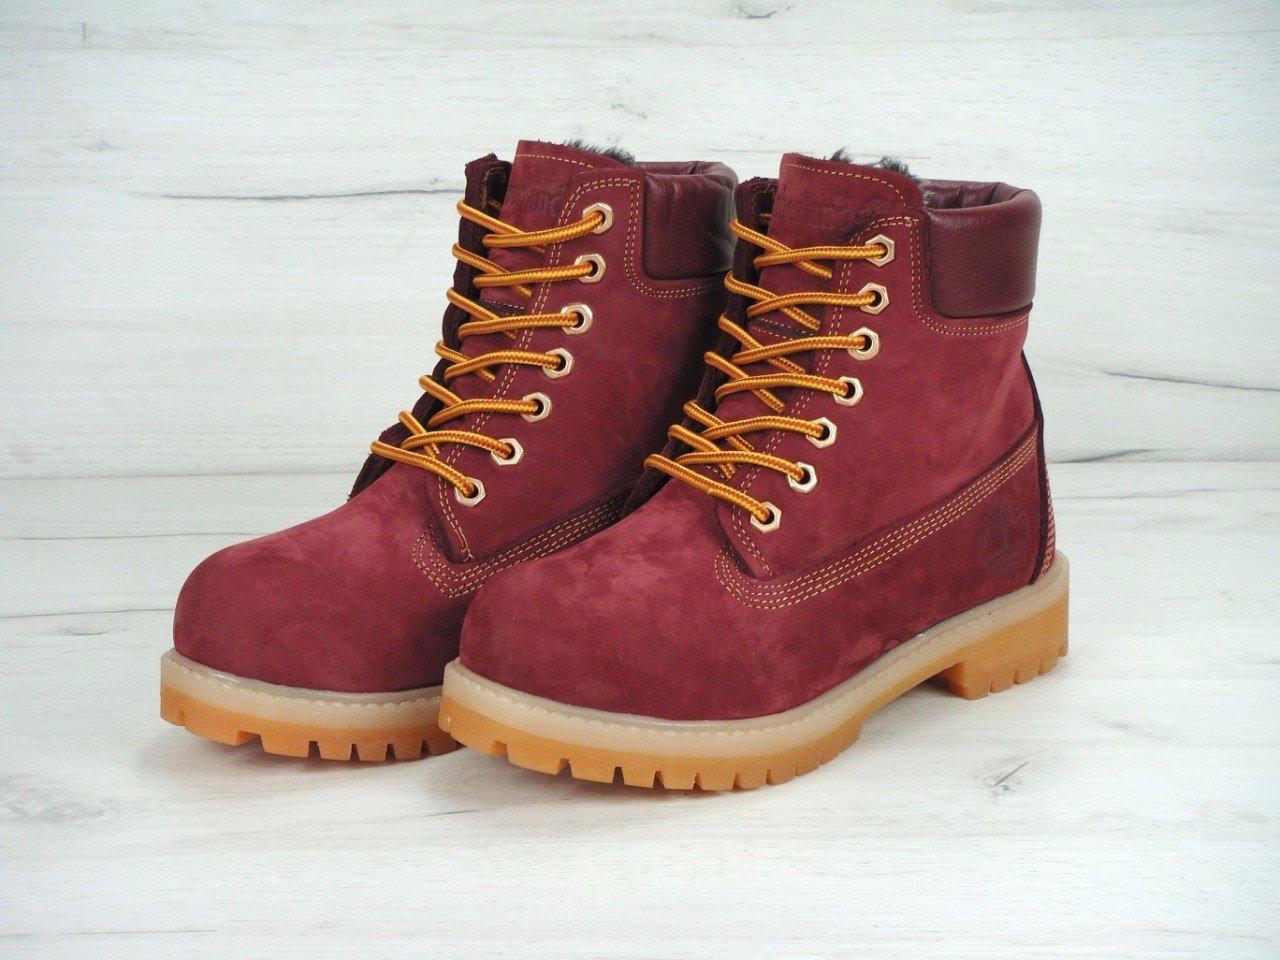 c3bdd7a4989d Ботинки Timberland женские зимние (бордовые), ТОП-реплика -  Интернет-магазин v